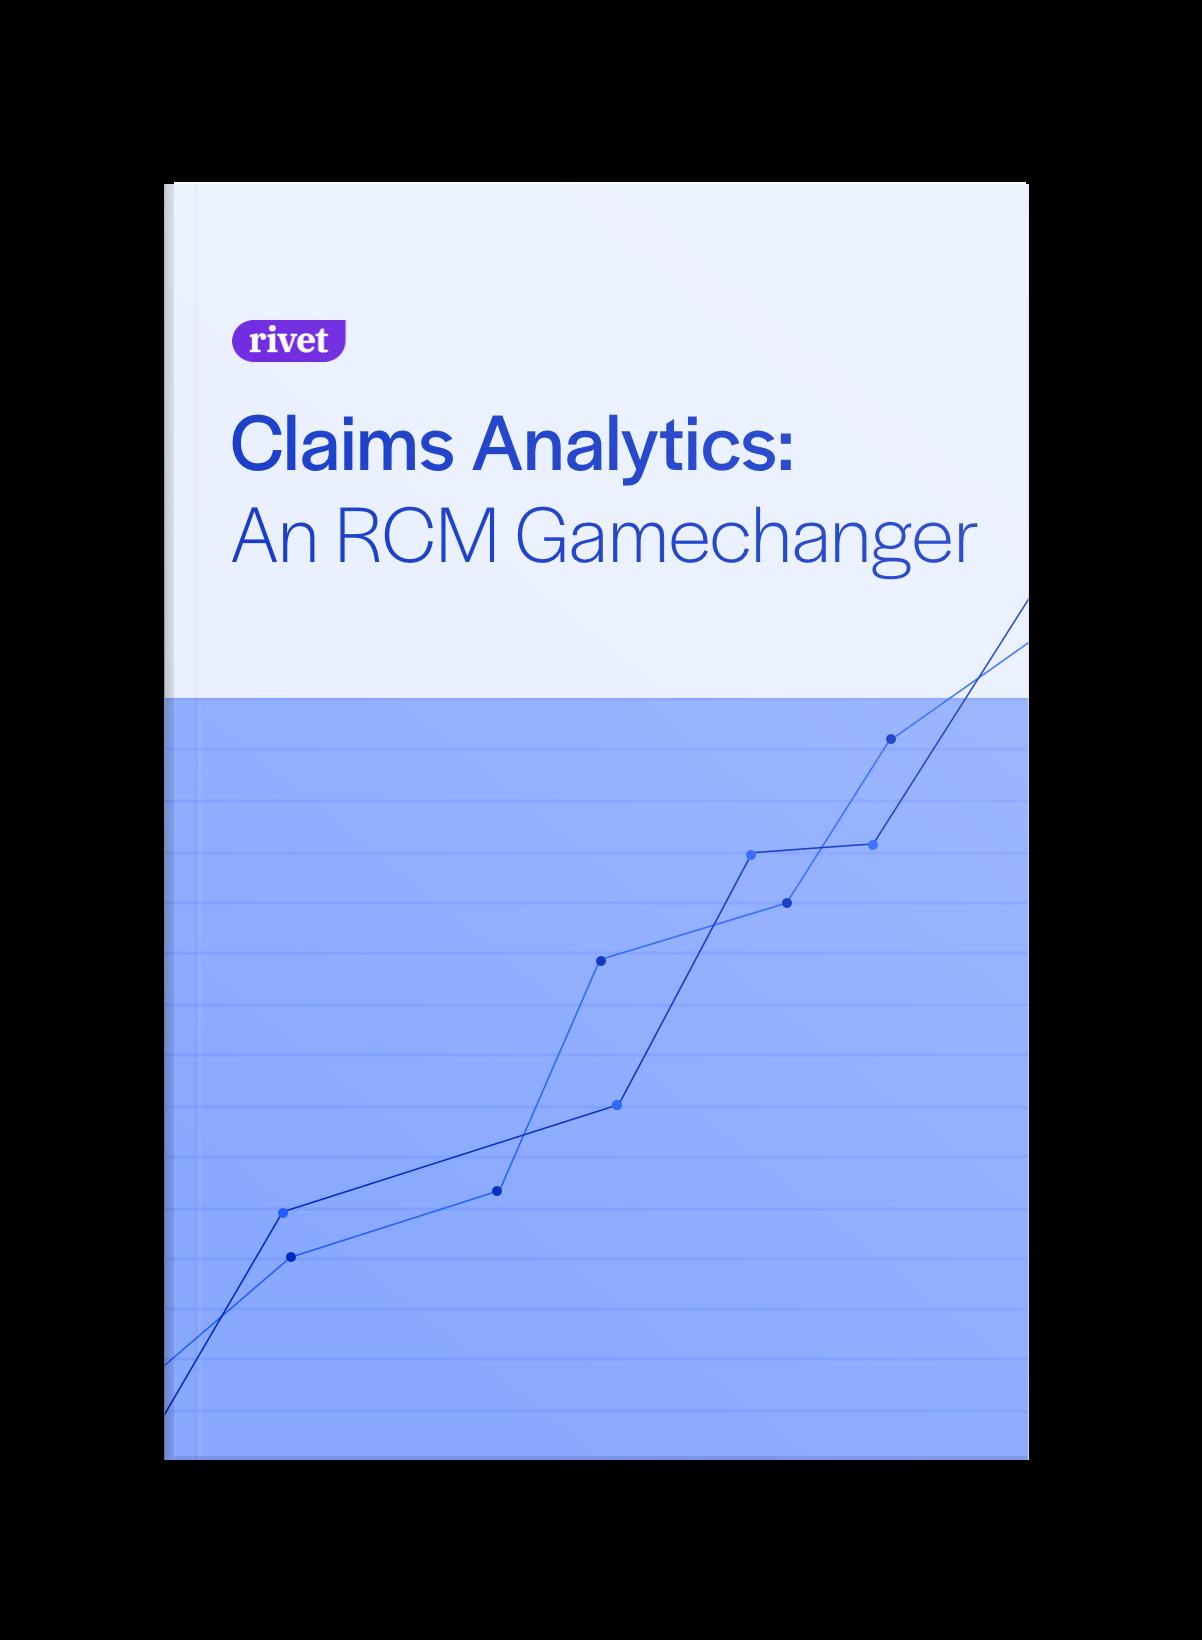 Mockup-Claims Analytics